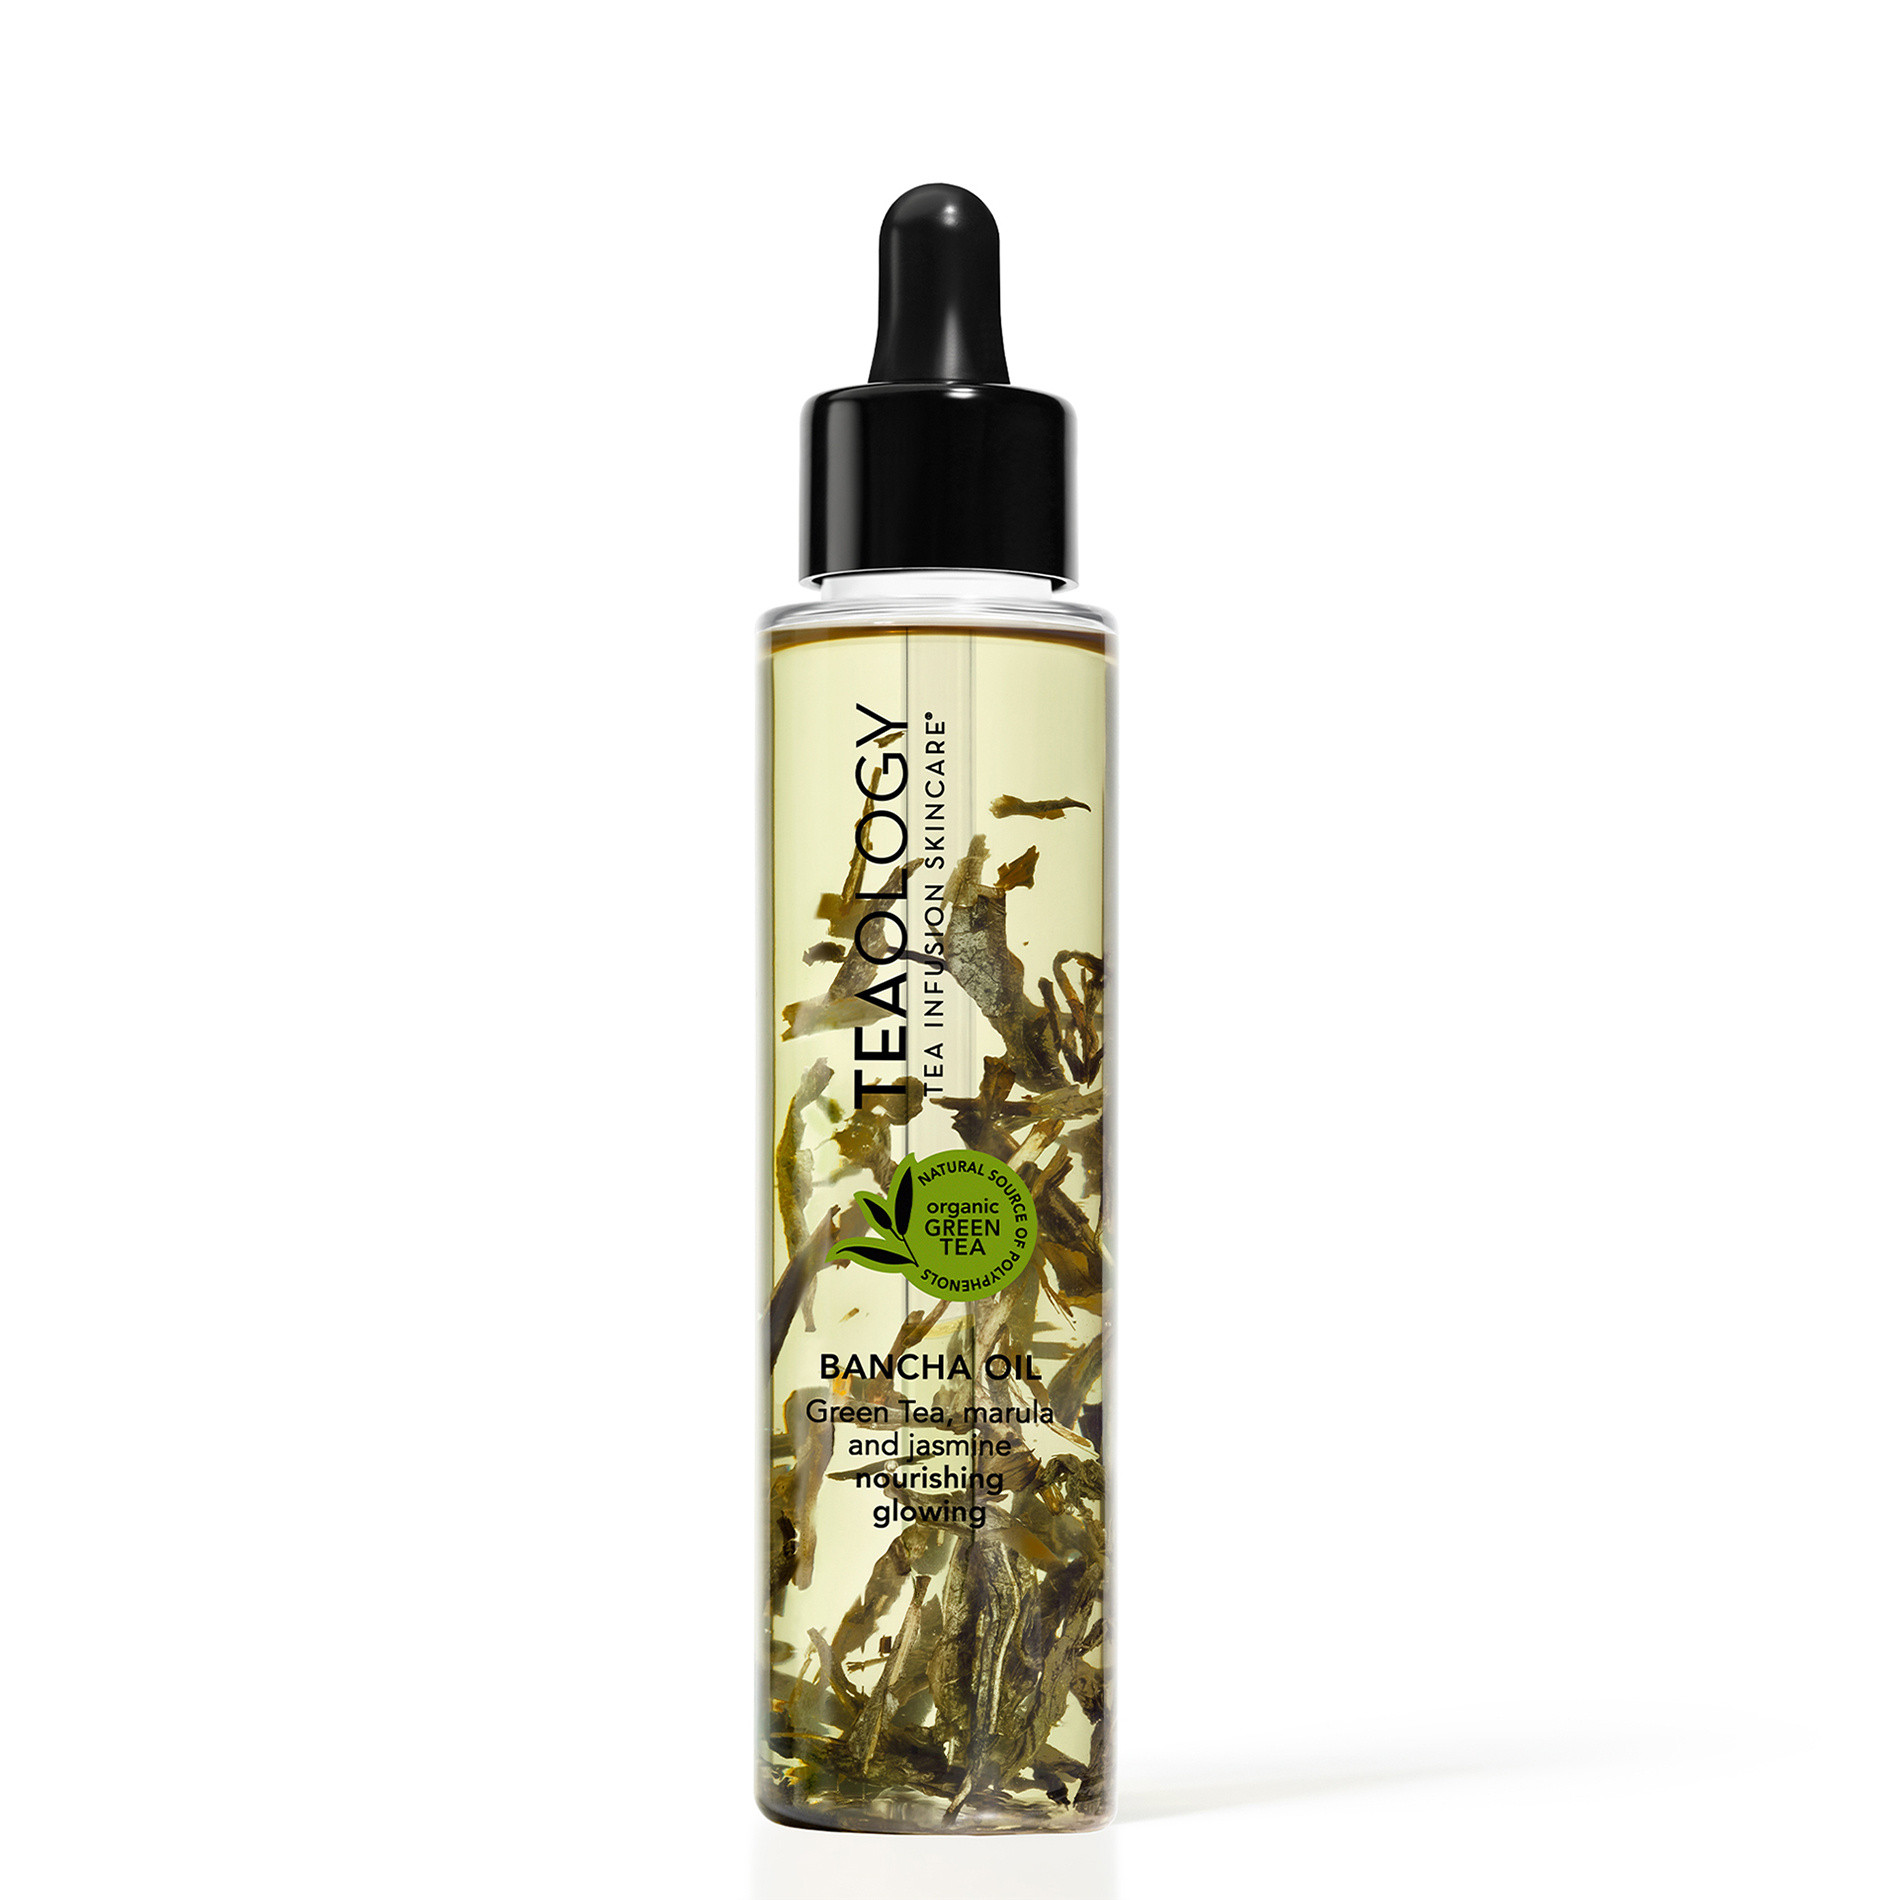 Teaology Bancha Oil 100 ml, Bianco, large image number 1